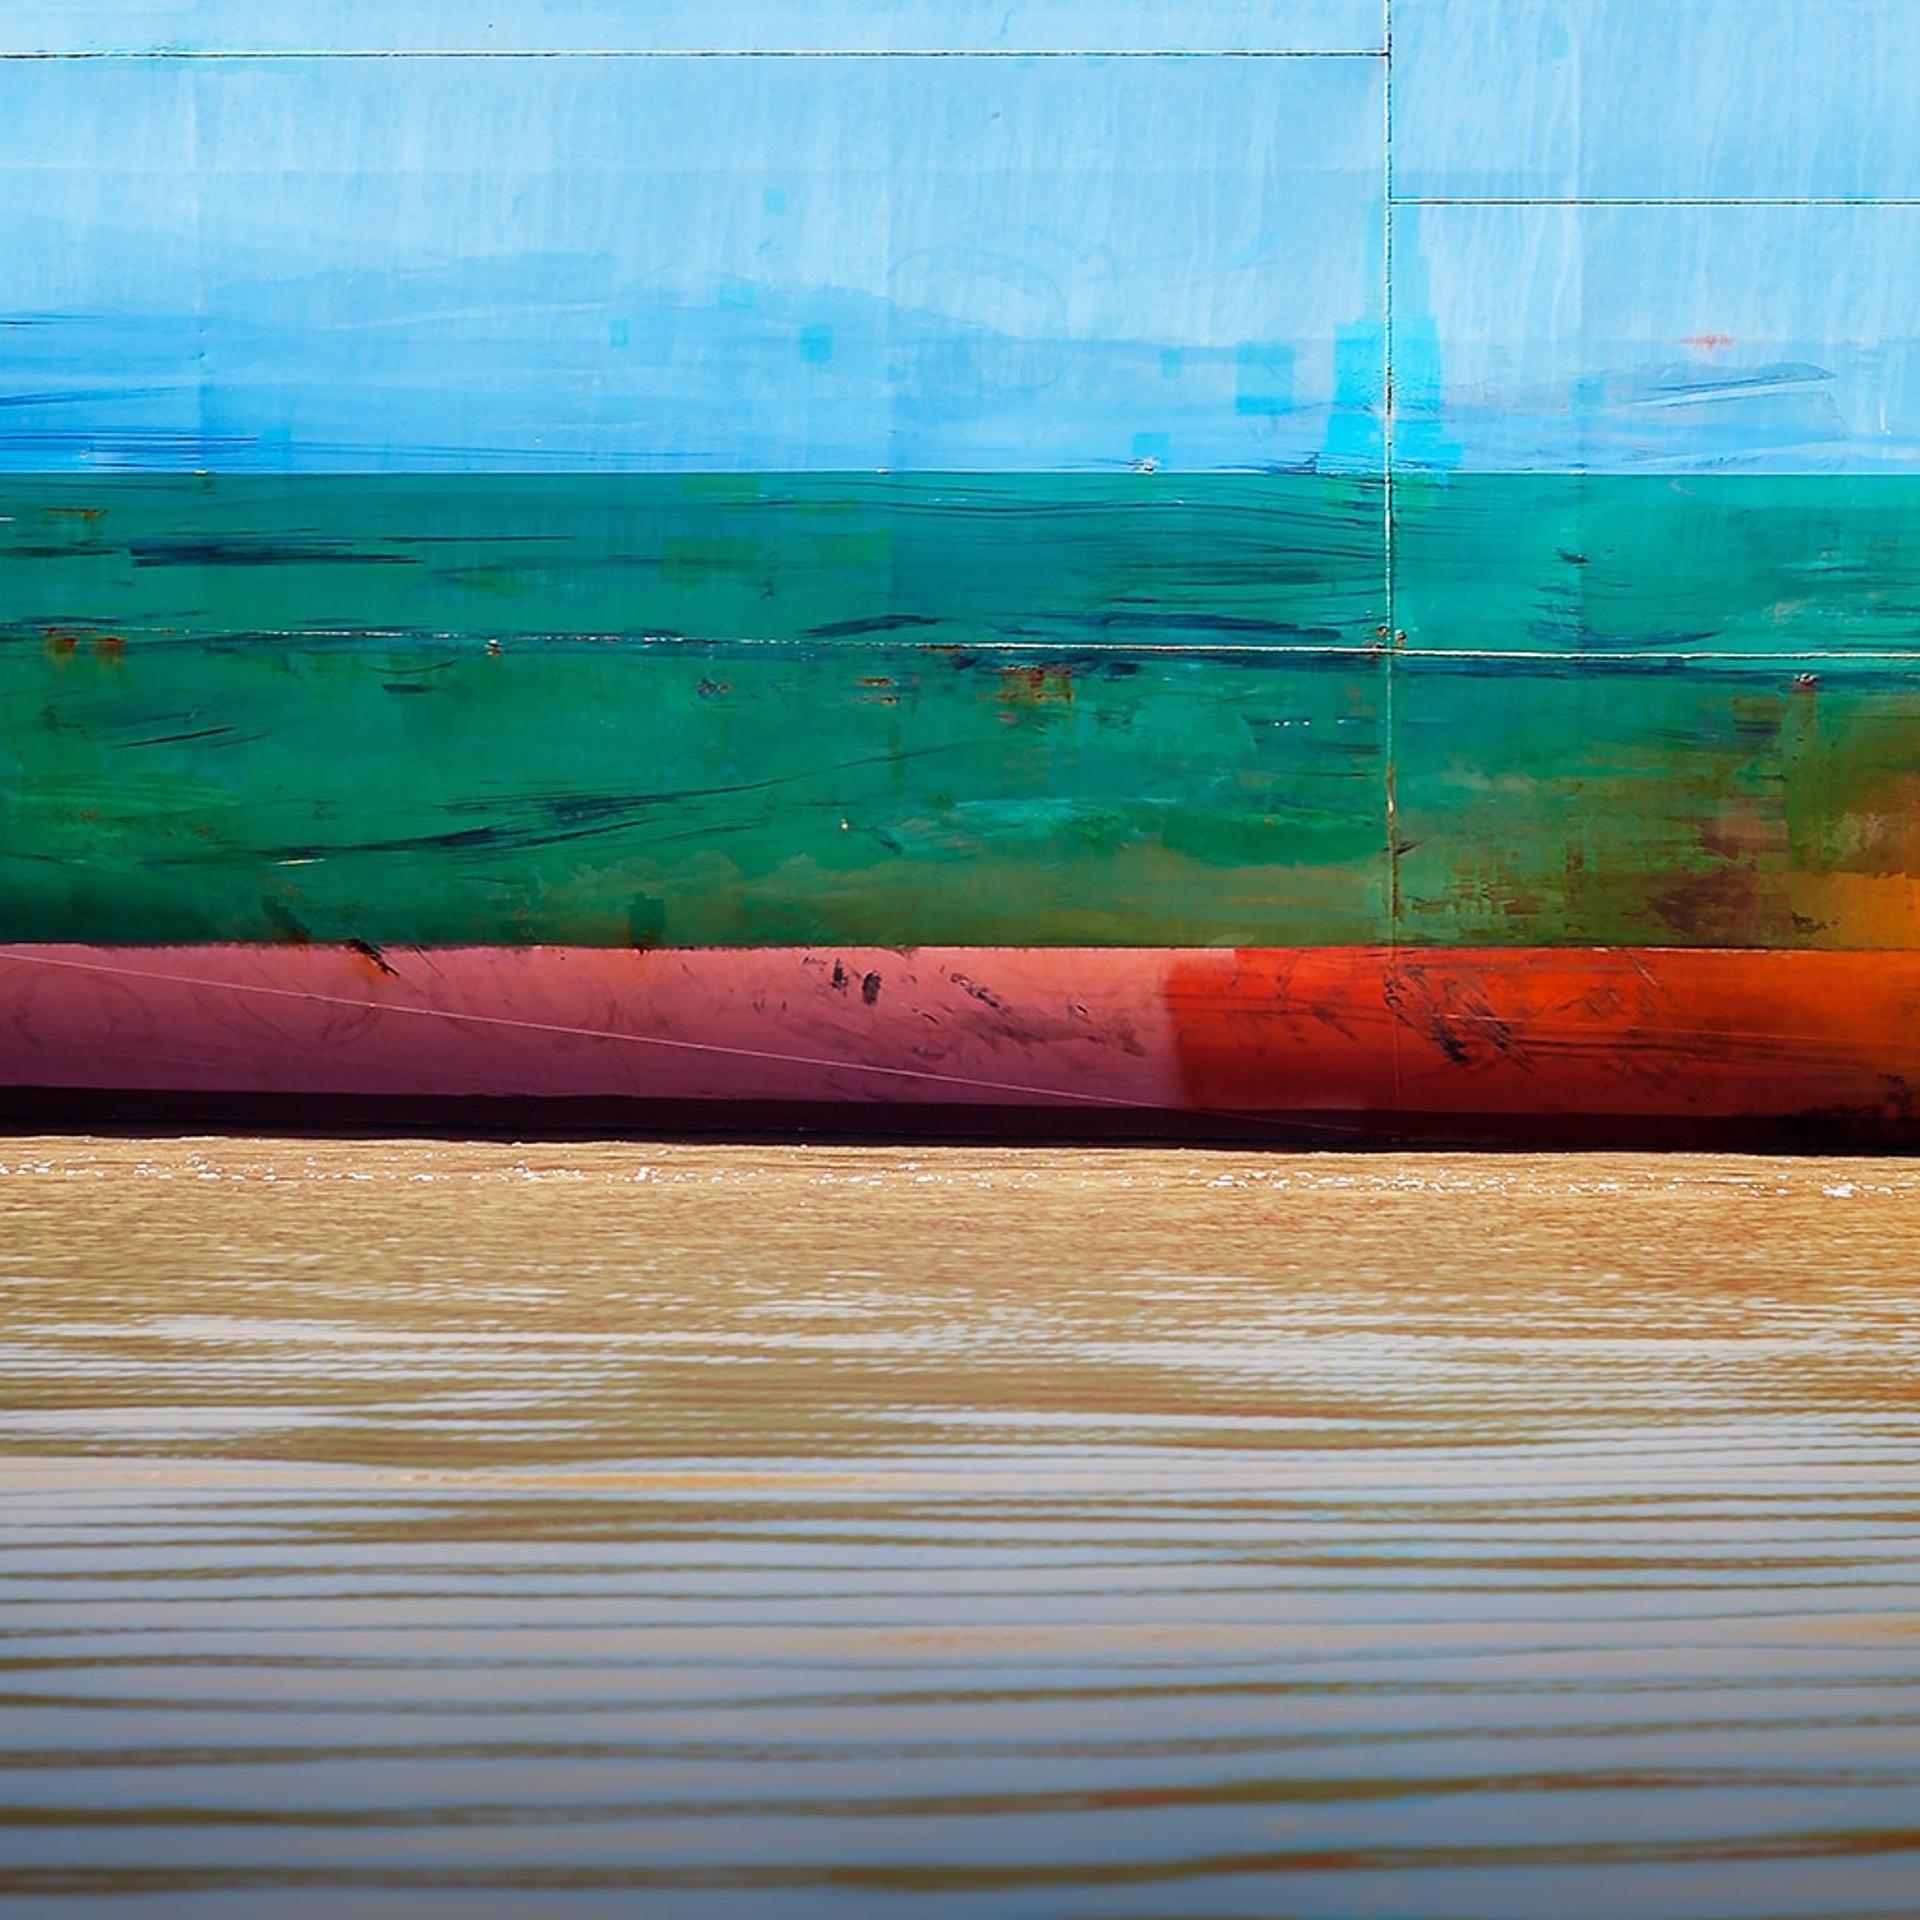 Rothko Series 2: BD-1-1 by Dan Kaufman